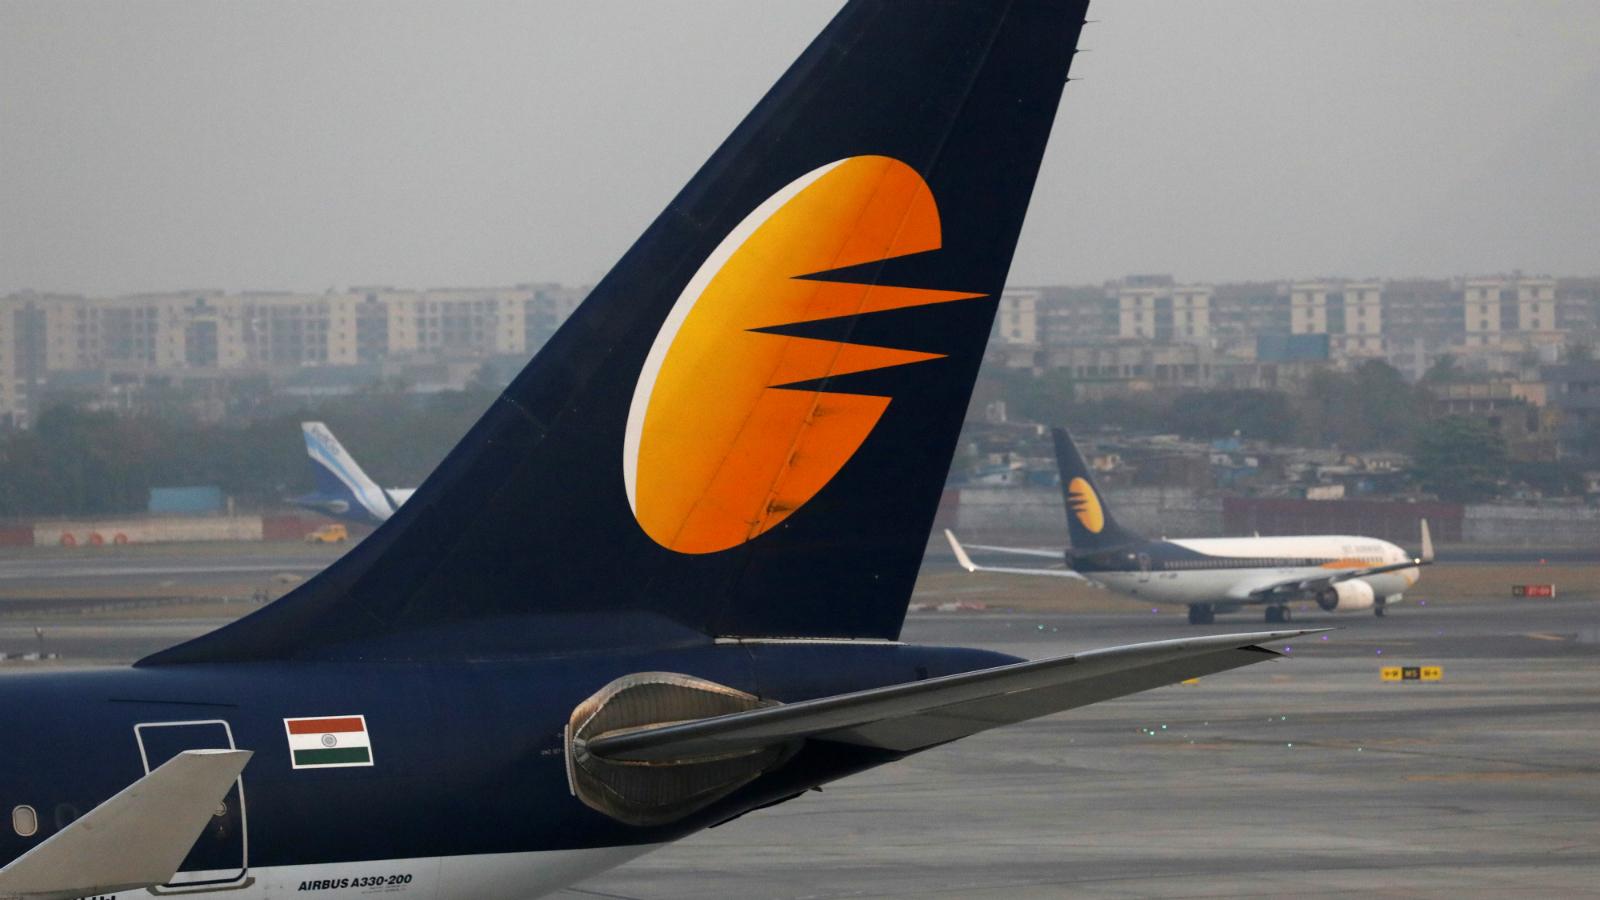 jet airways naresh goyal faces his toughest test yet quartz india